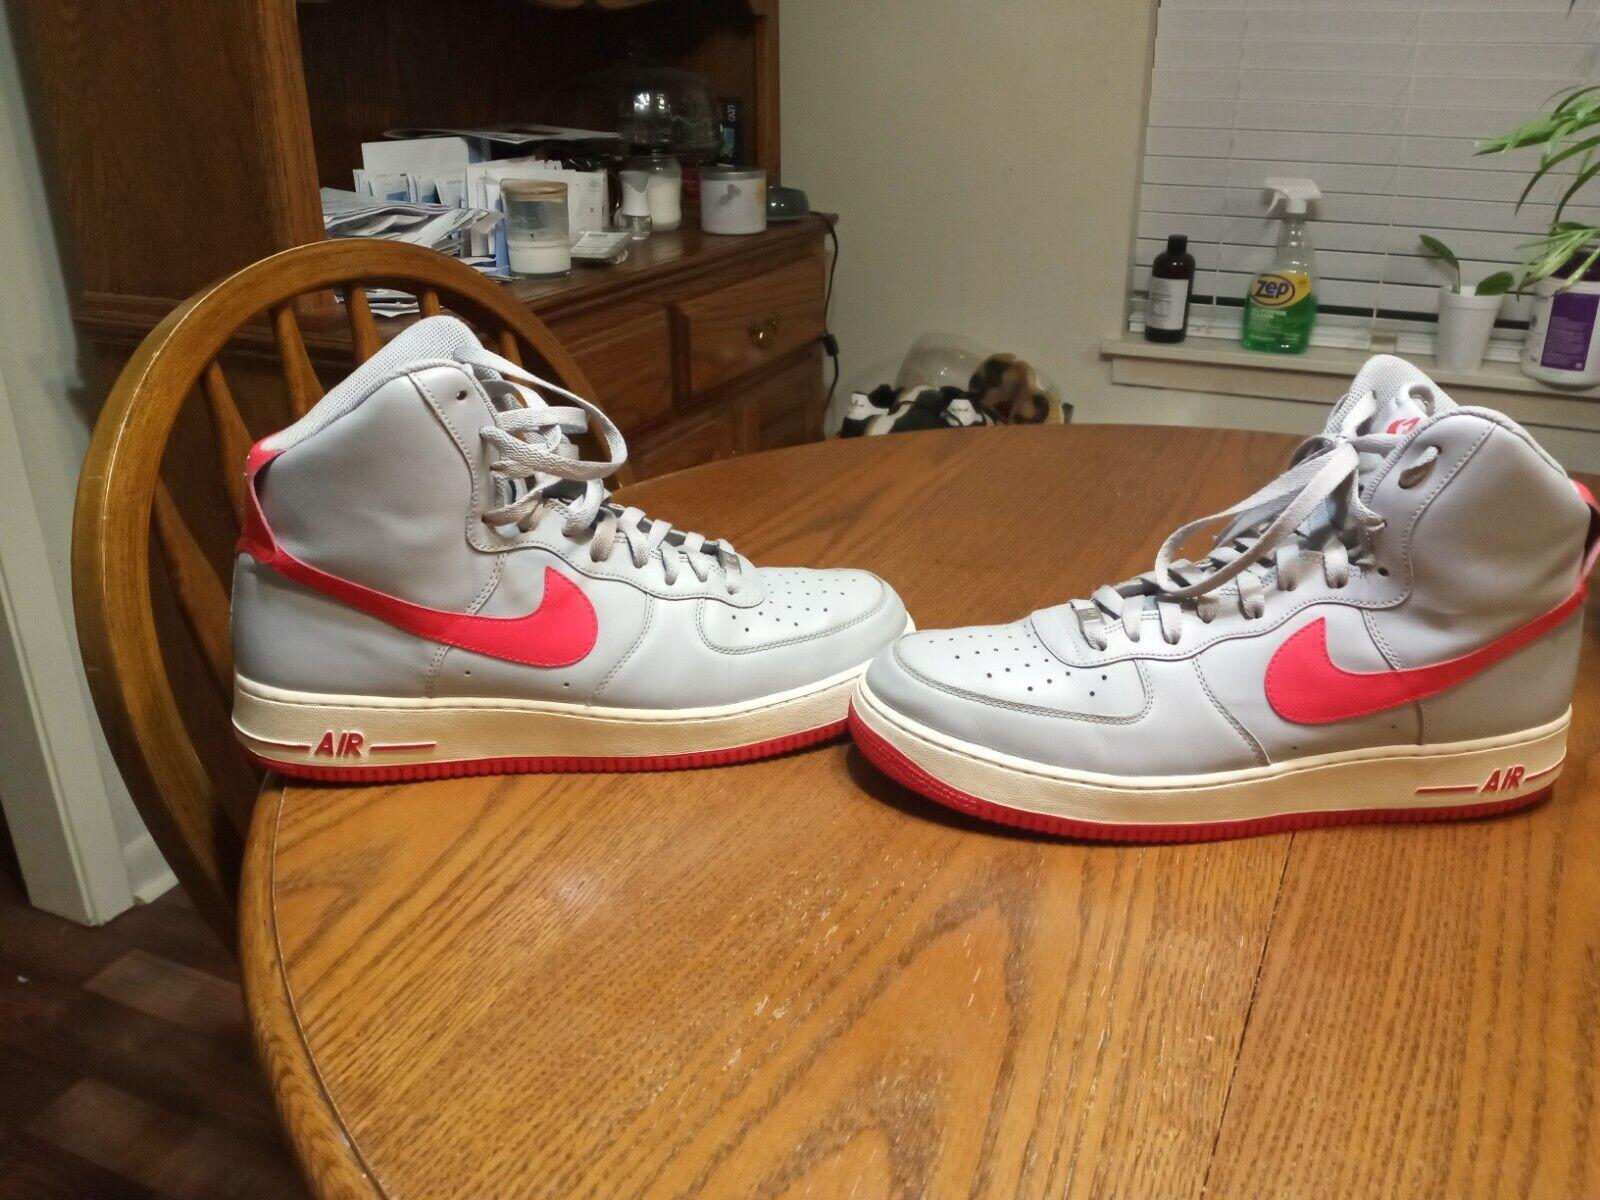 Nike Air Force 1 315121-019 - image 2